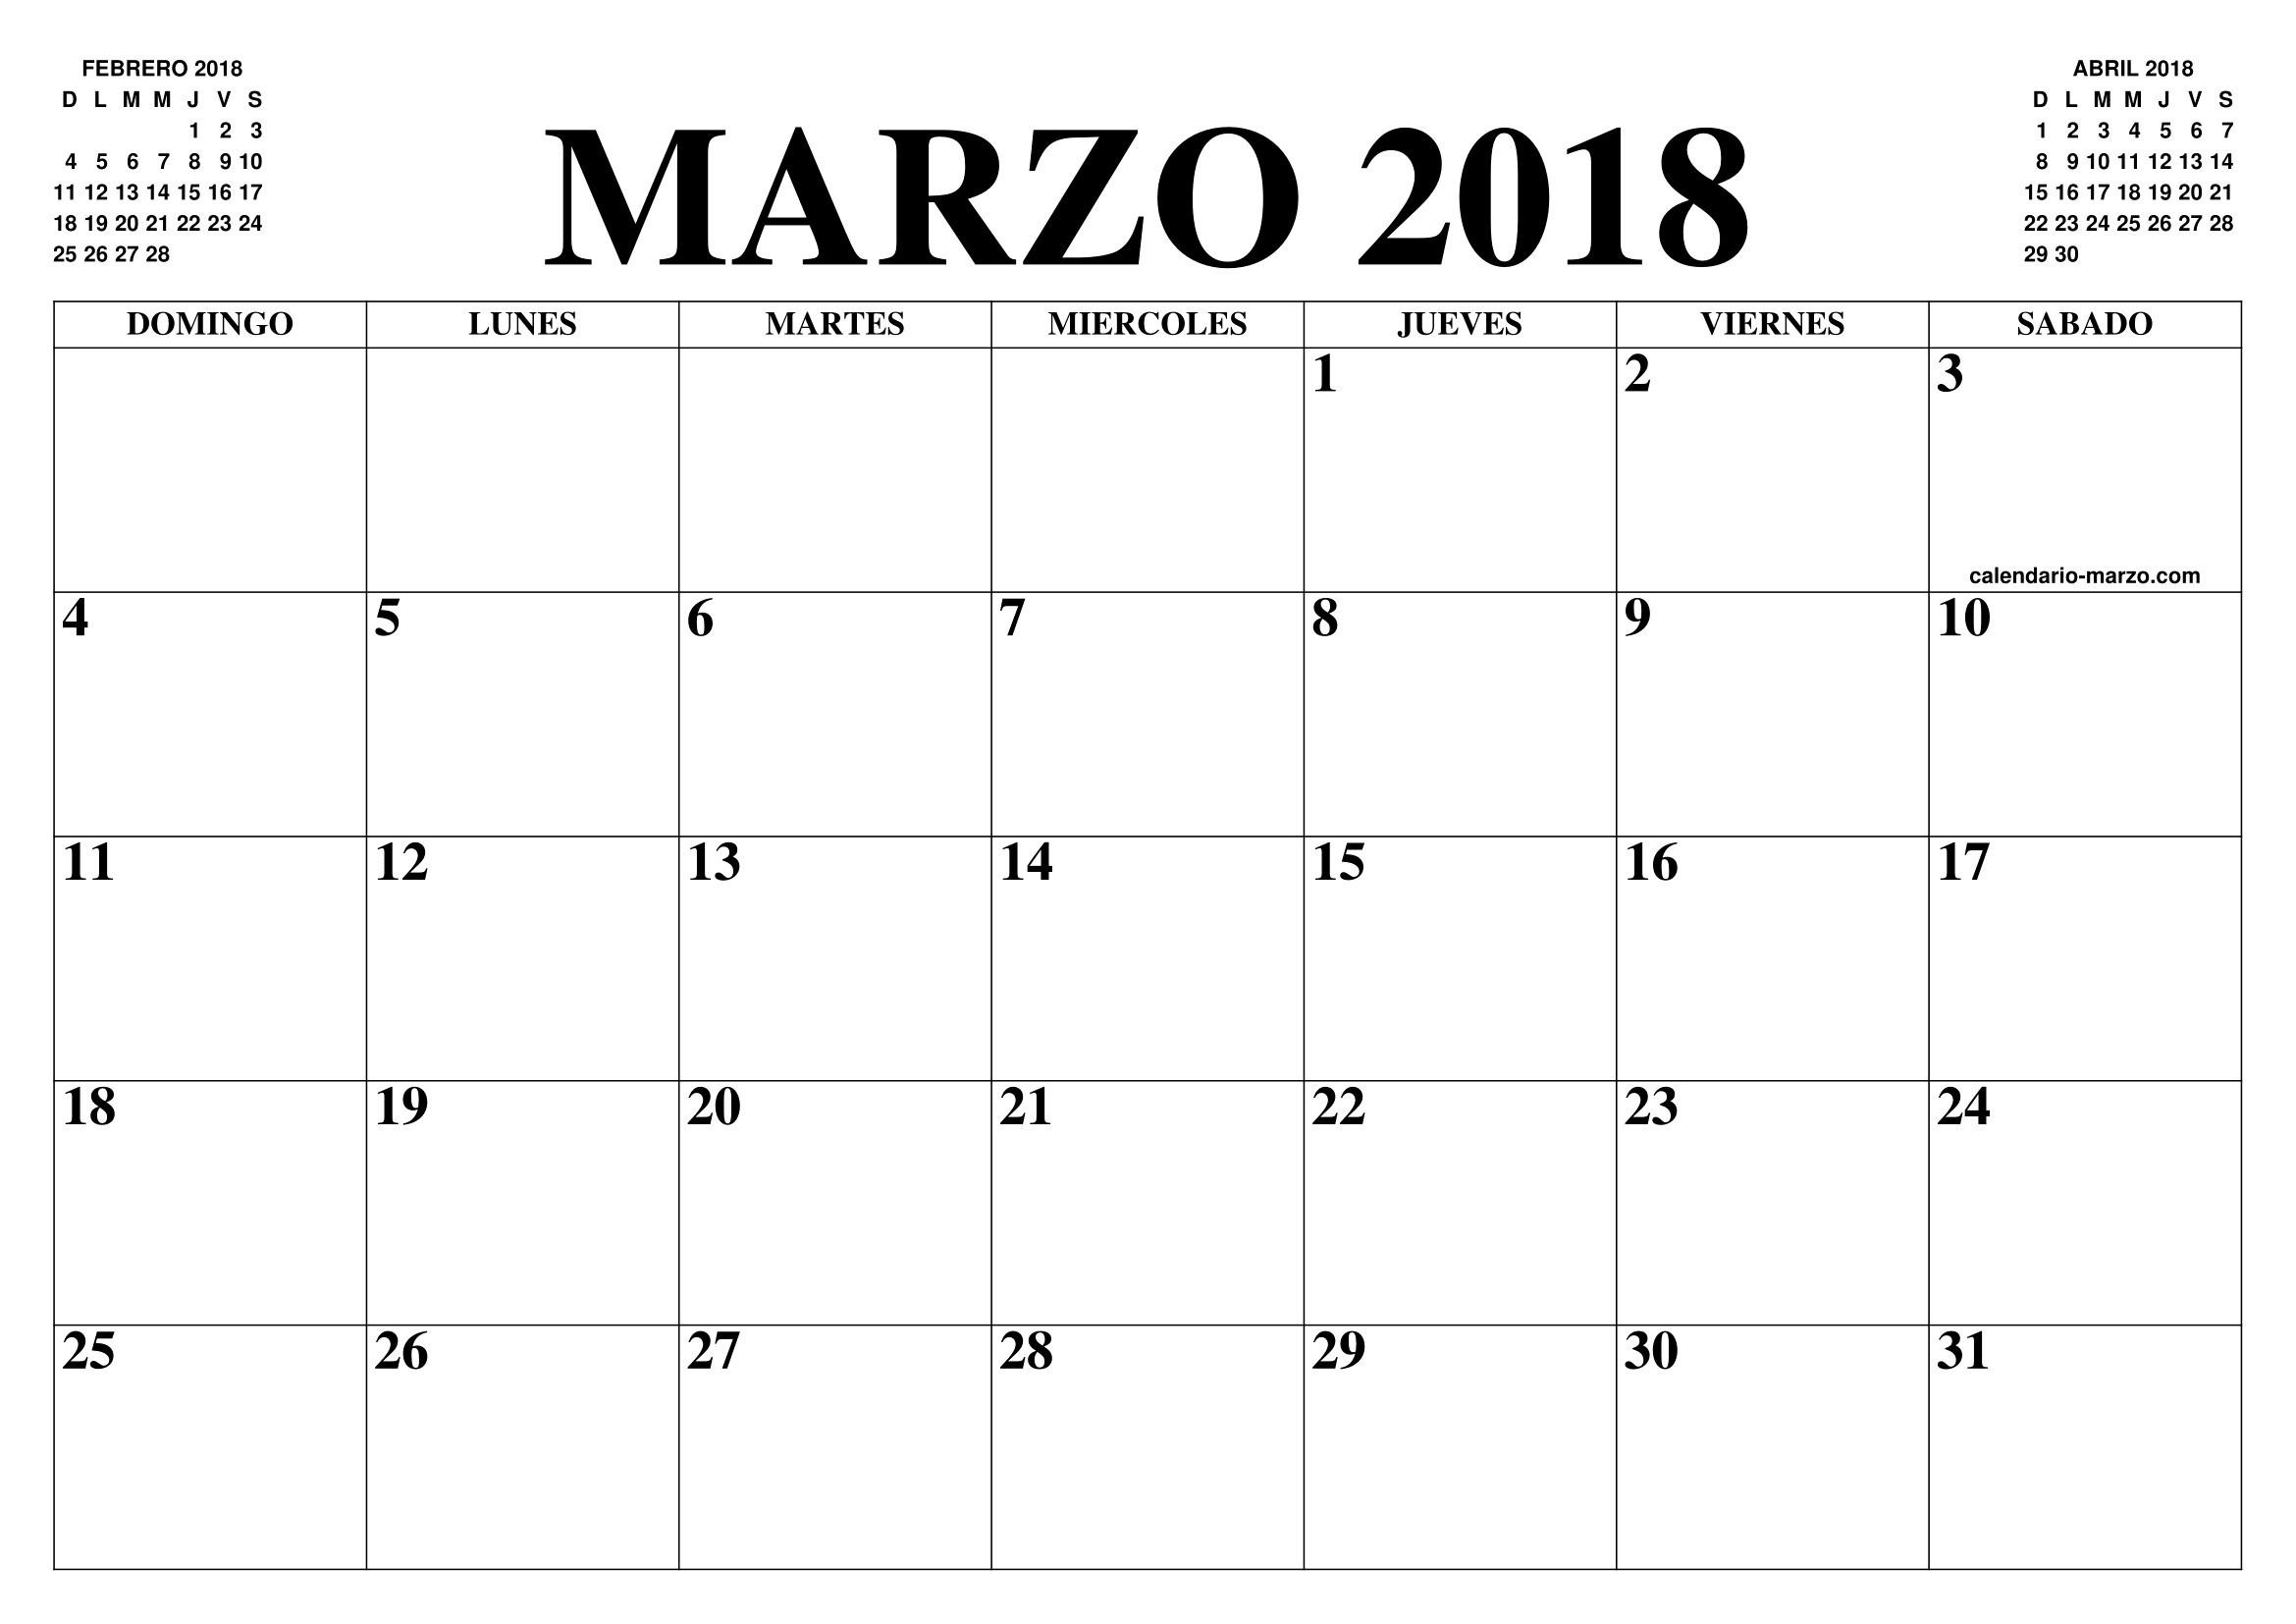 Calendario Laboral 2019 Malaga Más Recientes Armoured Vehicles Latin America ⁓ these Gym Virtual Of Calendario Laboral 2019 Malaga Actual Unicaci³n – Medena